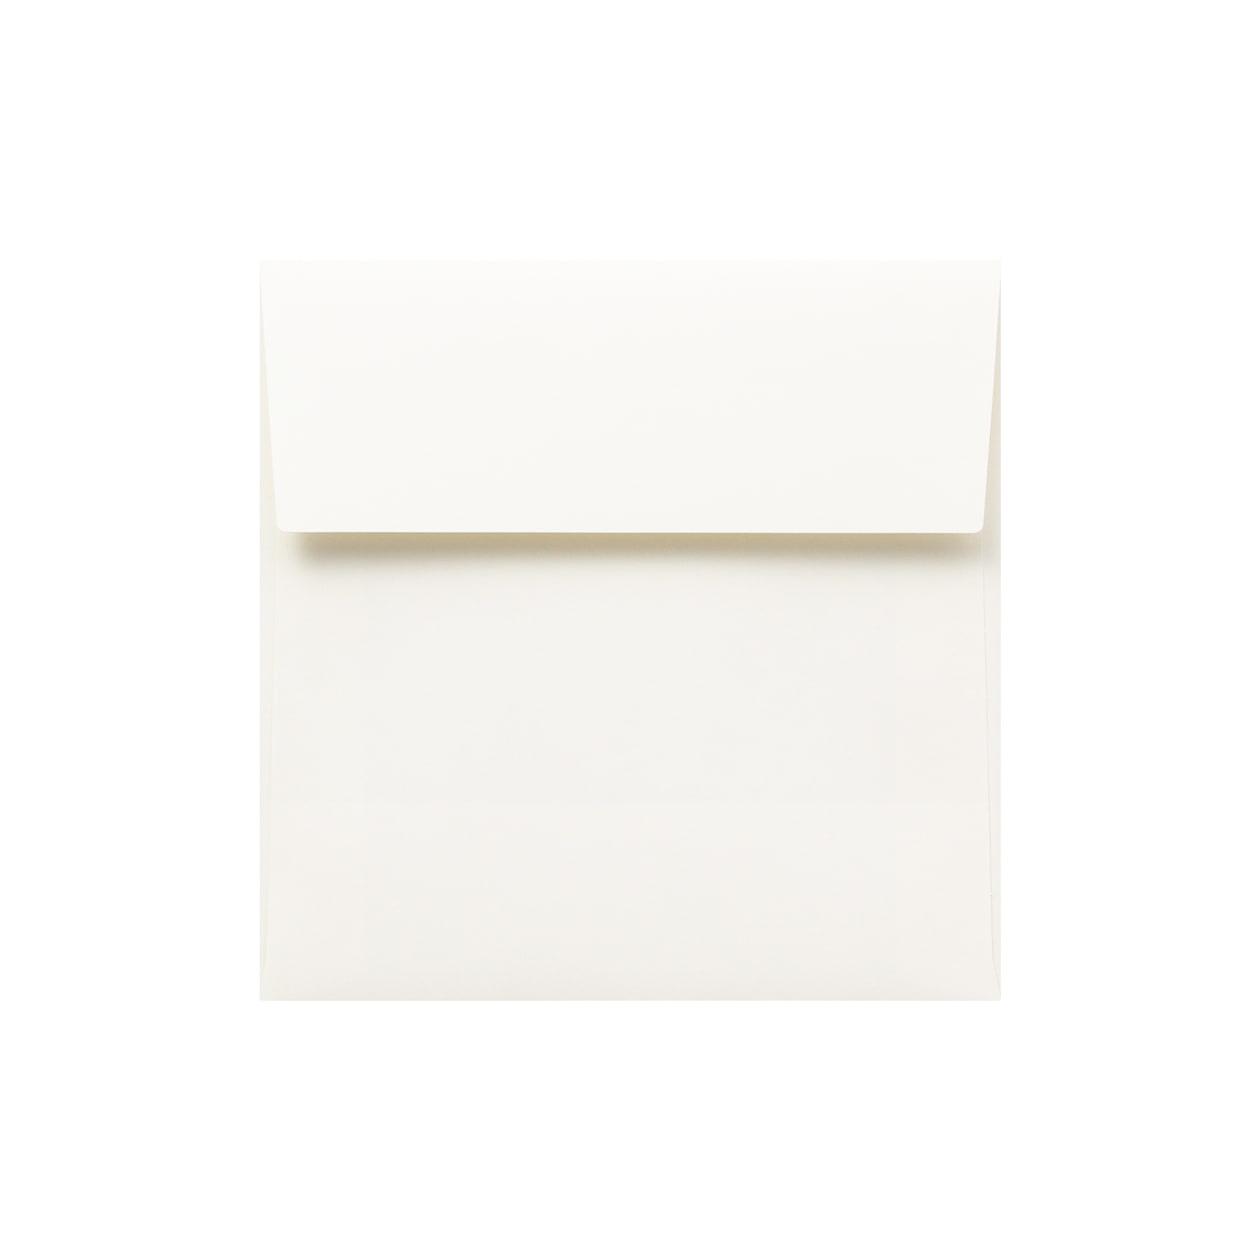 SE16カマス封筒 HAGURUMA Basic ソフトクリーム 100g